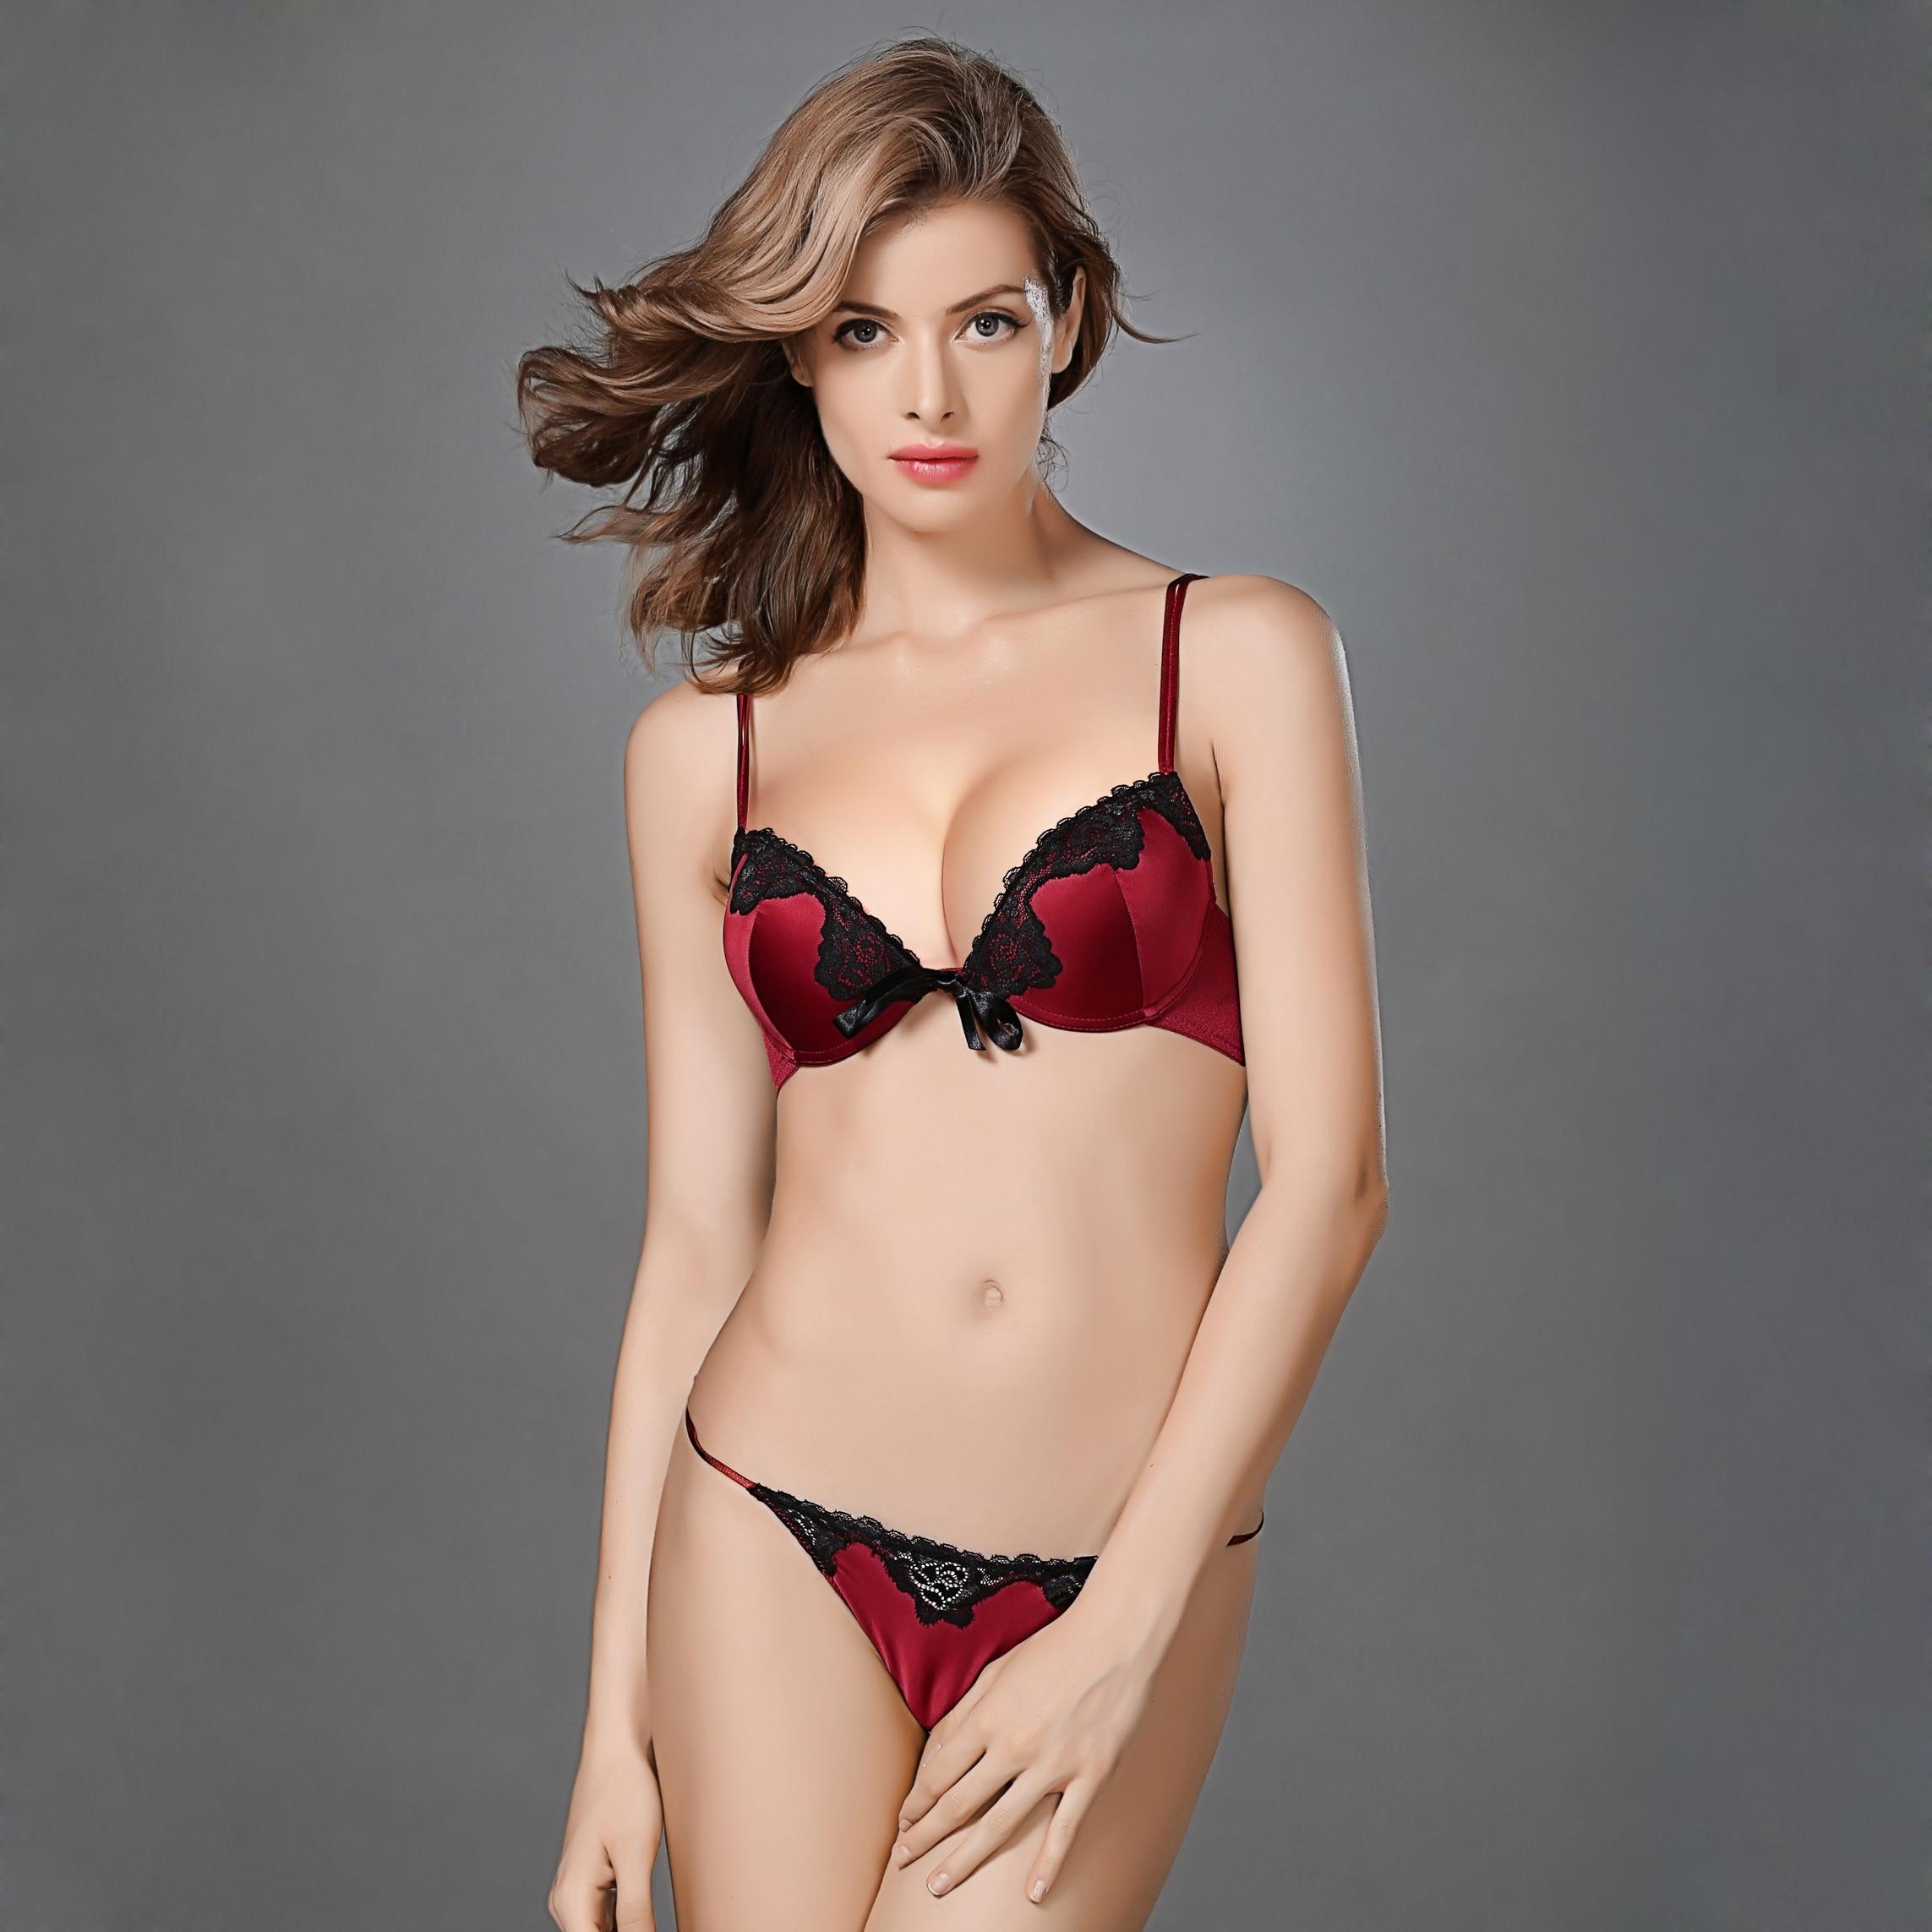 c12e2d1f4d7 Padded Bra Set Silk Push Up Girls Small Bra Thong Sets Lace B Cup 70B 75B  80B 85B France Sexy Lingerie Underwear Women G-string